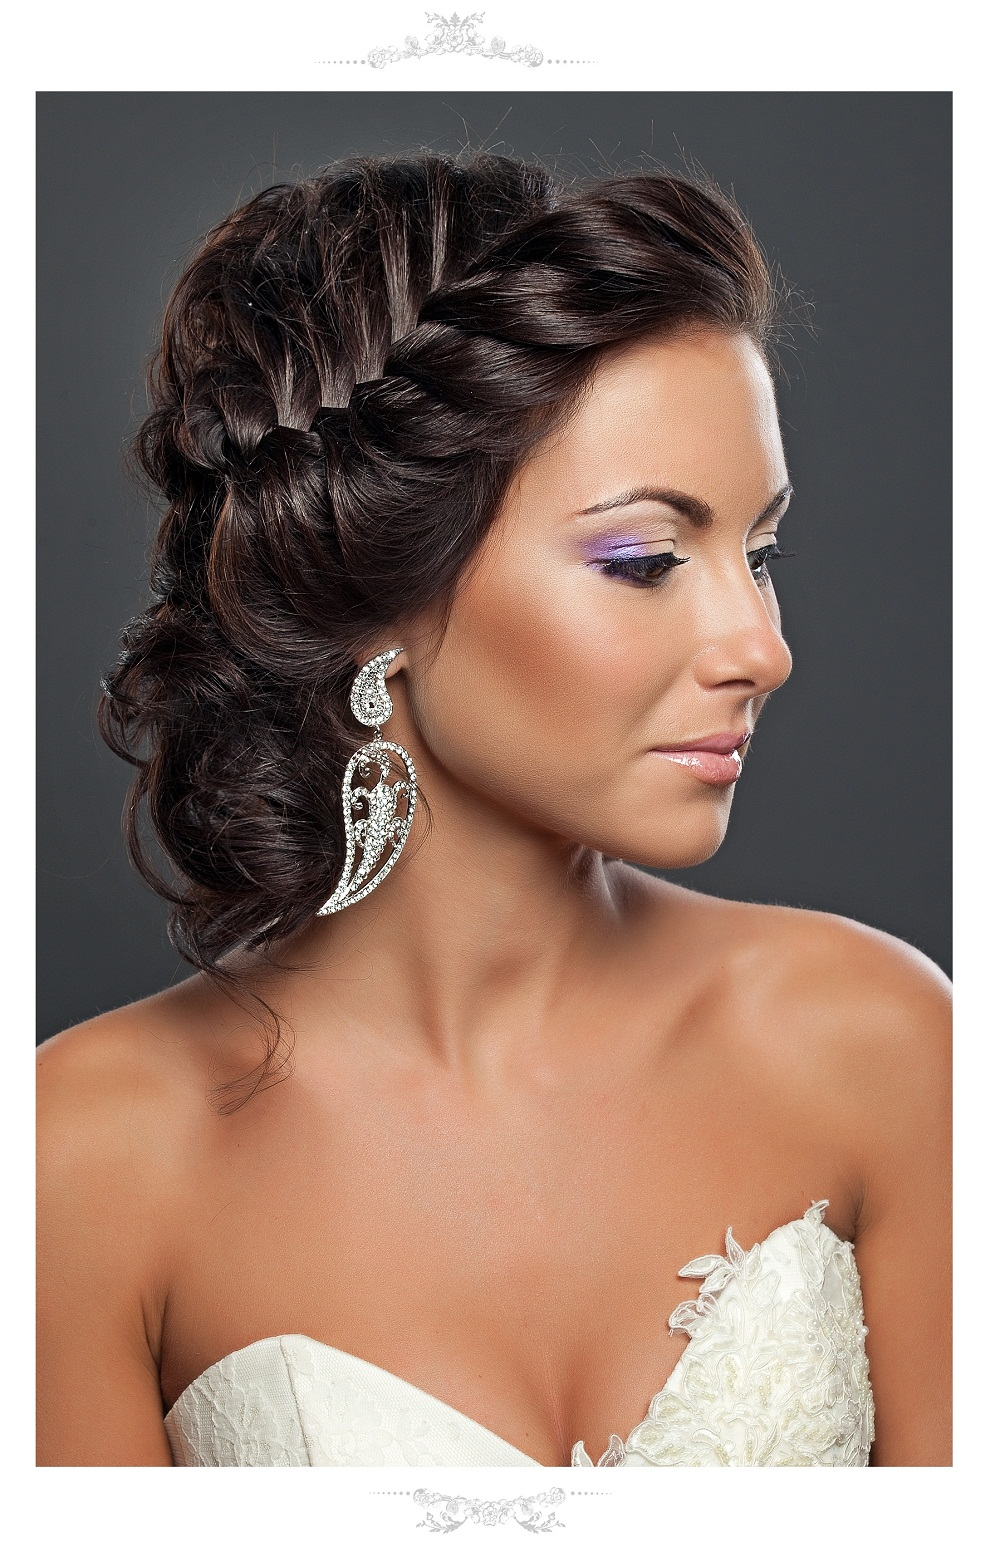 svadebnye-pricheski-na-volosy-do-plech-foto Прическа с косами на свадьбу